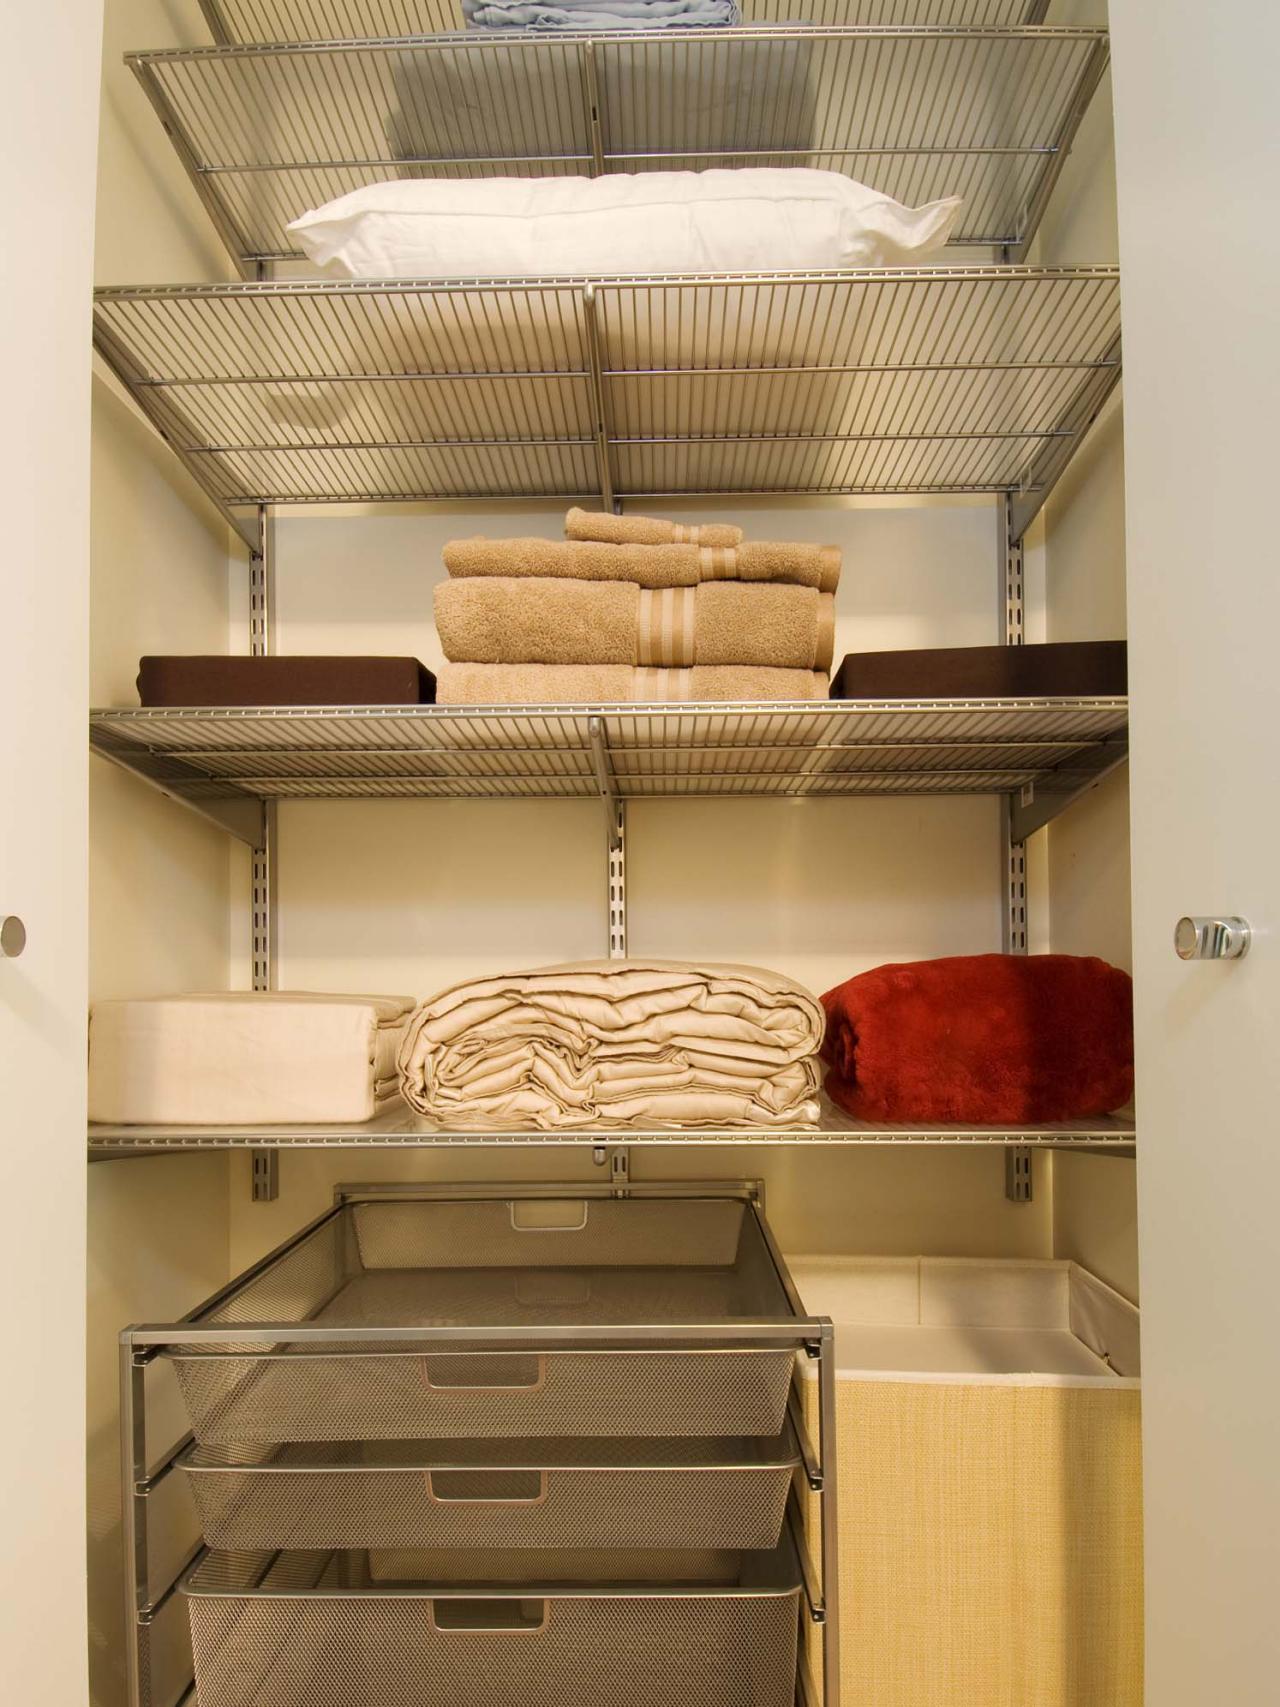 walk-in-linen-closet-design-photo-8